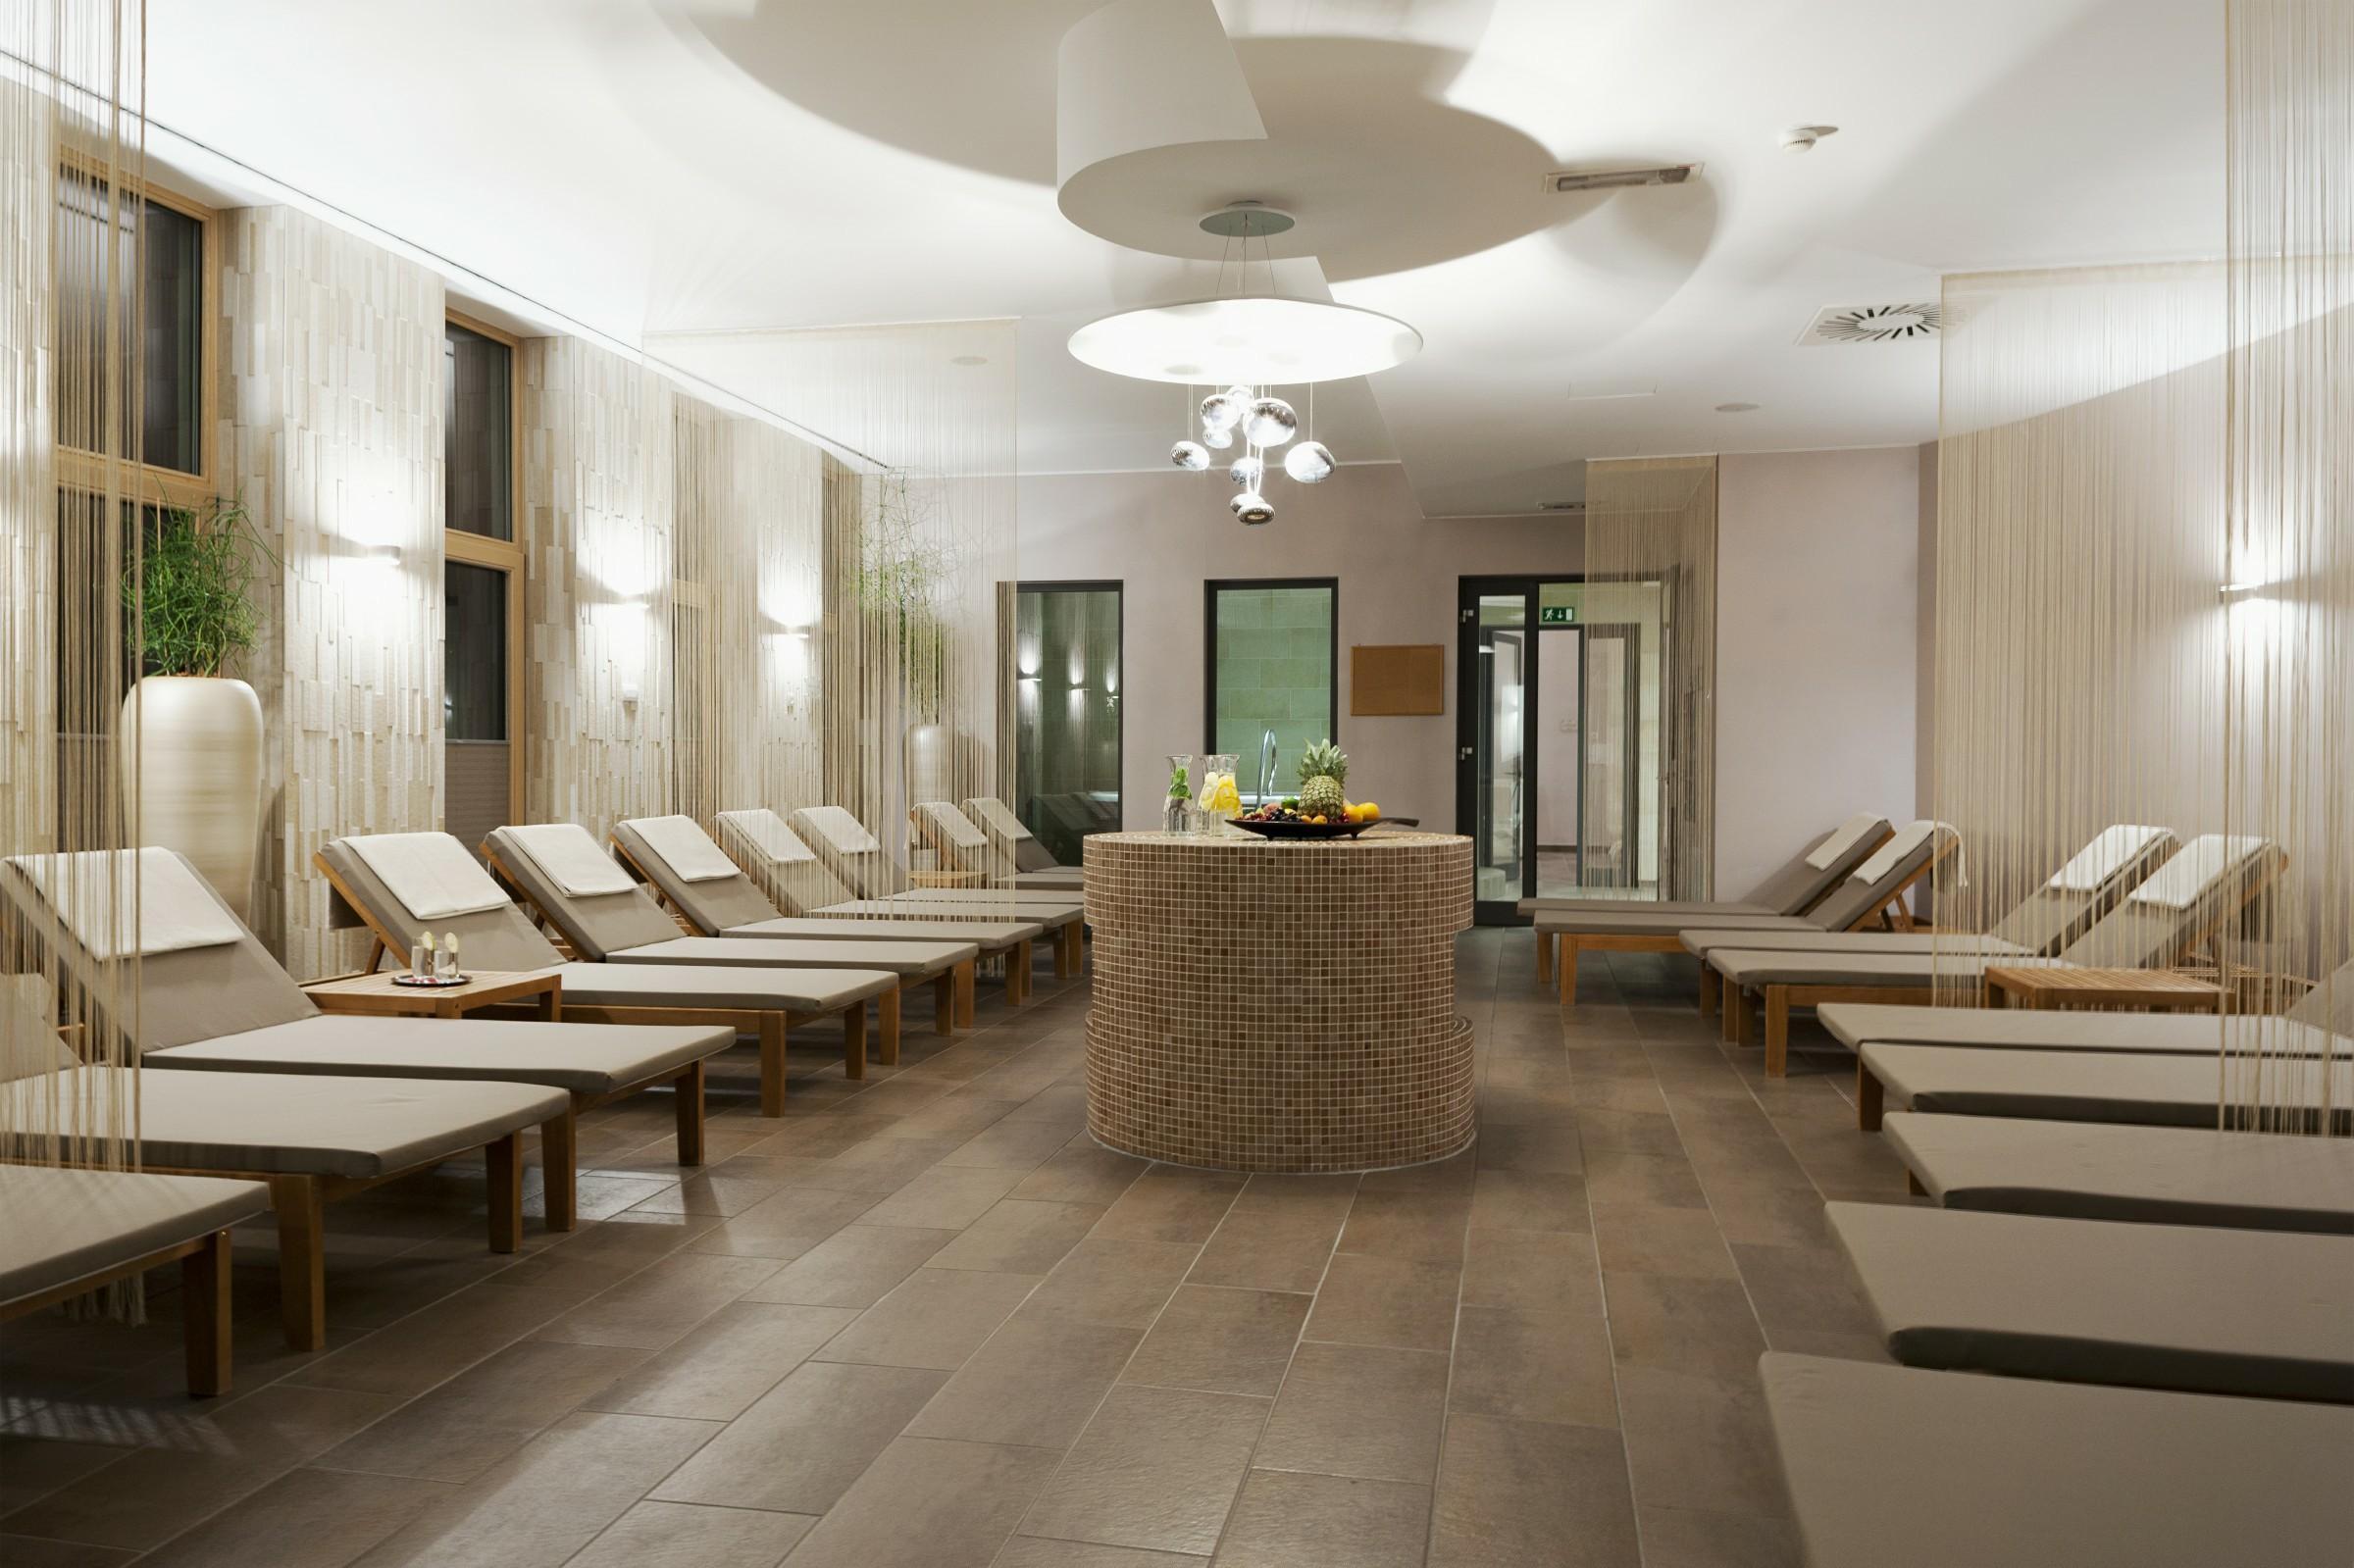 Hotel_Golte (5)